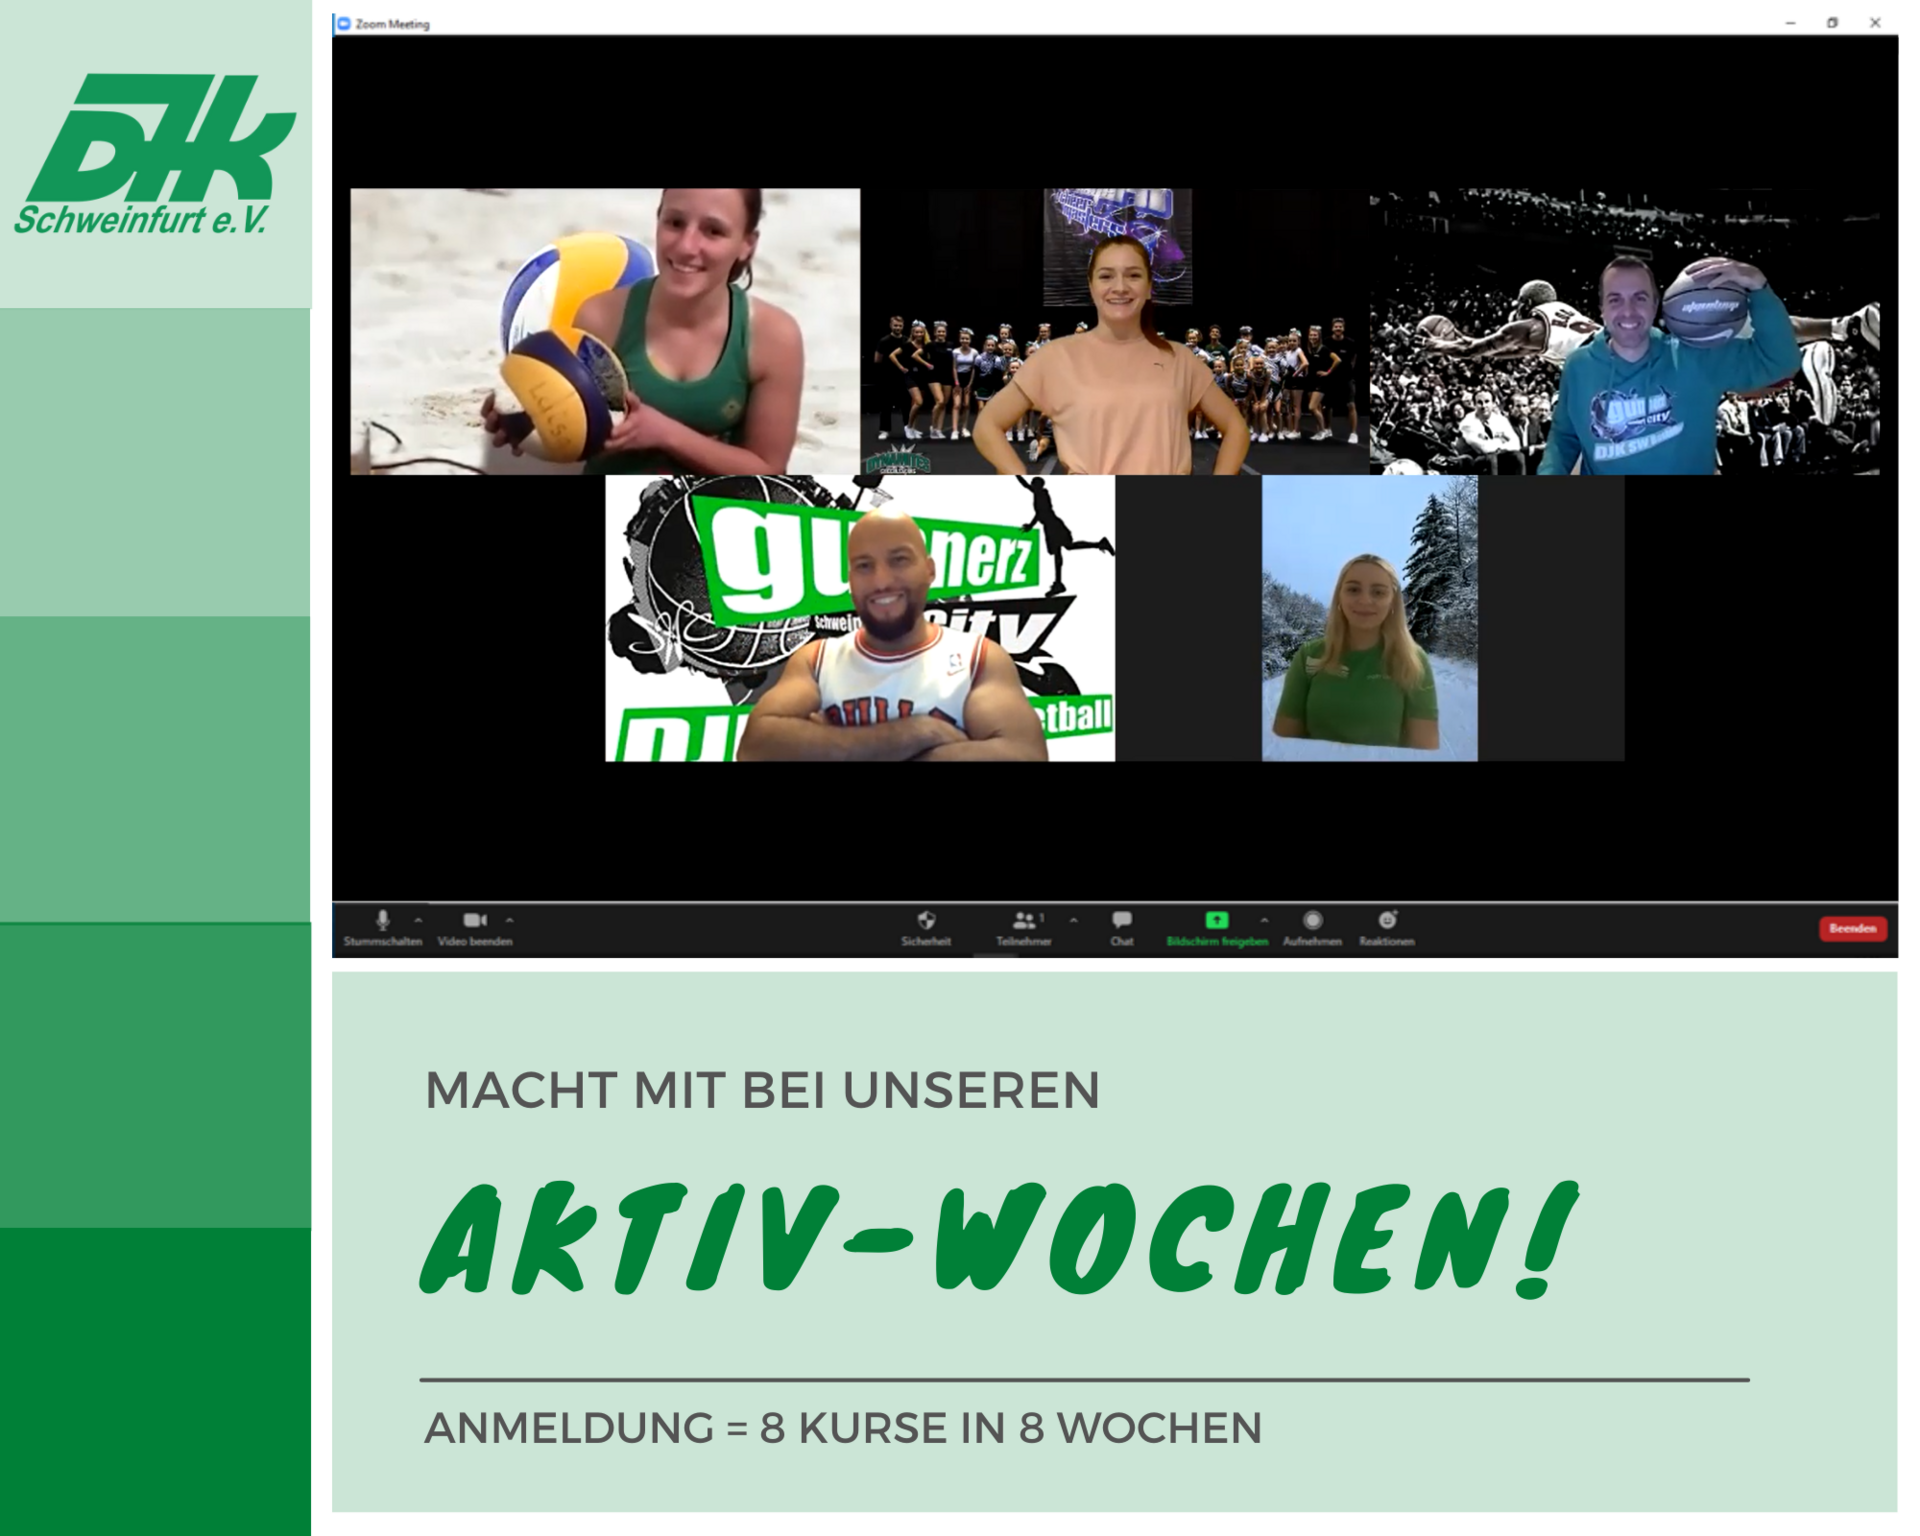 DJK Aktiv-Wochen